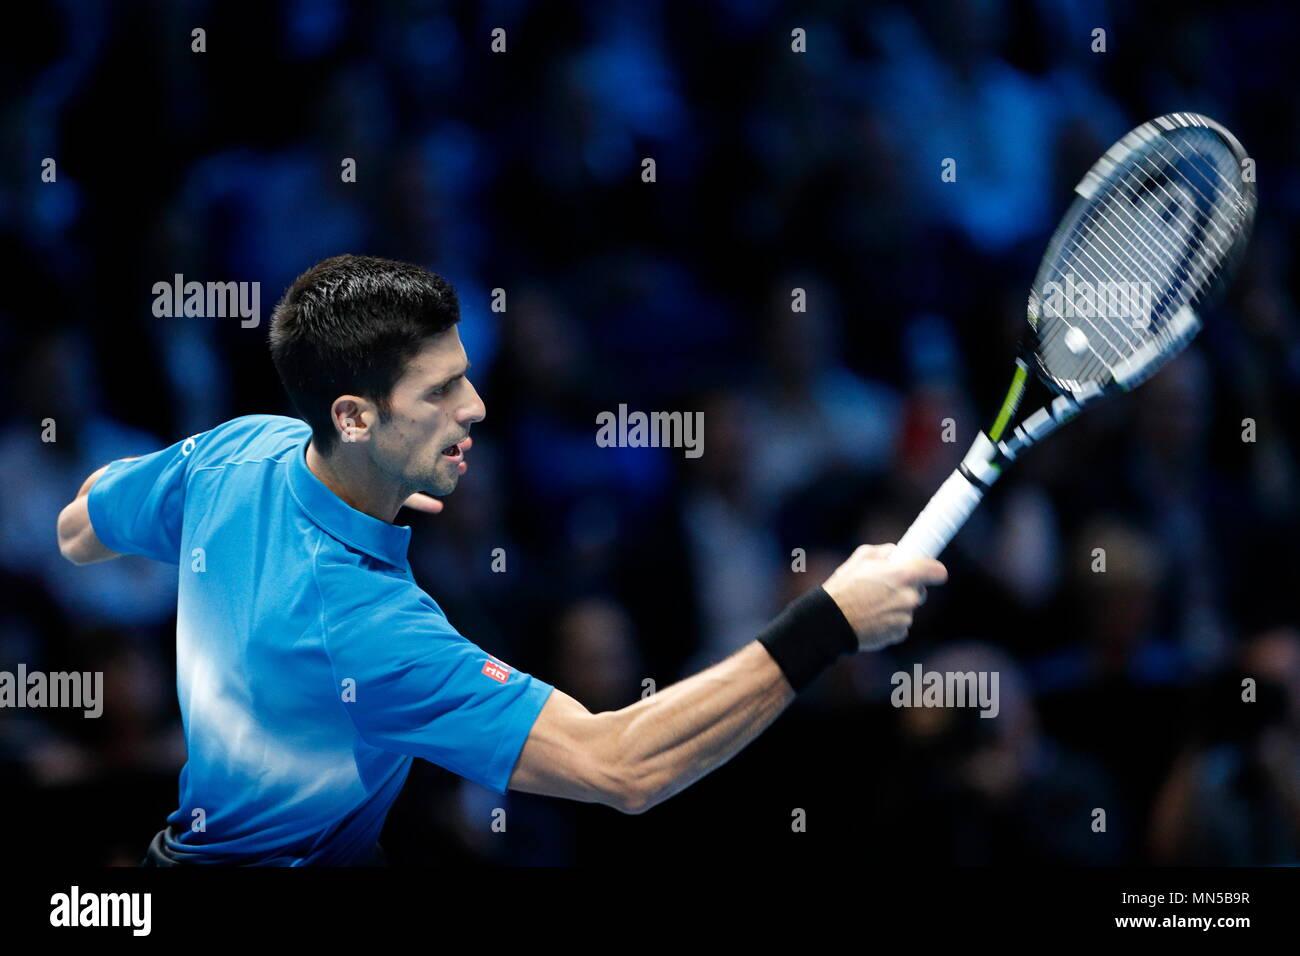 Novak Djokovic vs Tomas Berdych during Day 4 of the 2015 Barclays ATP World Tour Finals - O2 Arena London England. 19 November 2015 - Stock Image